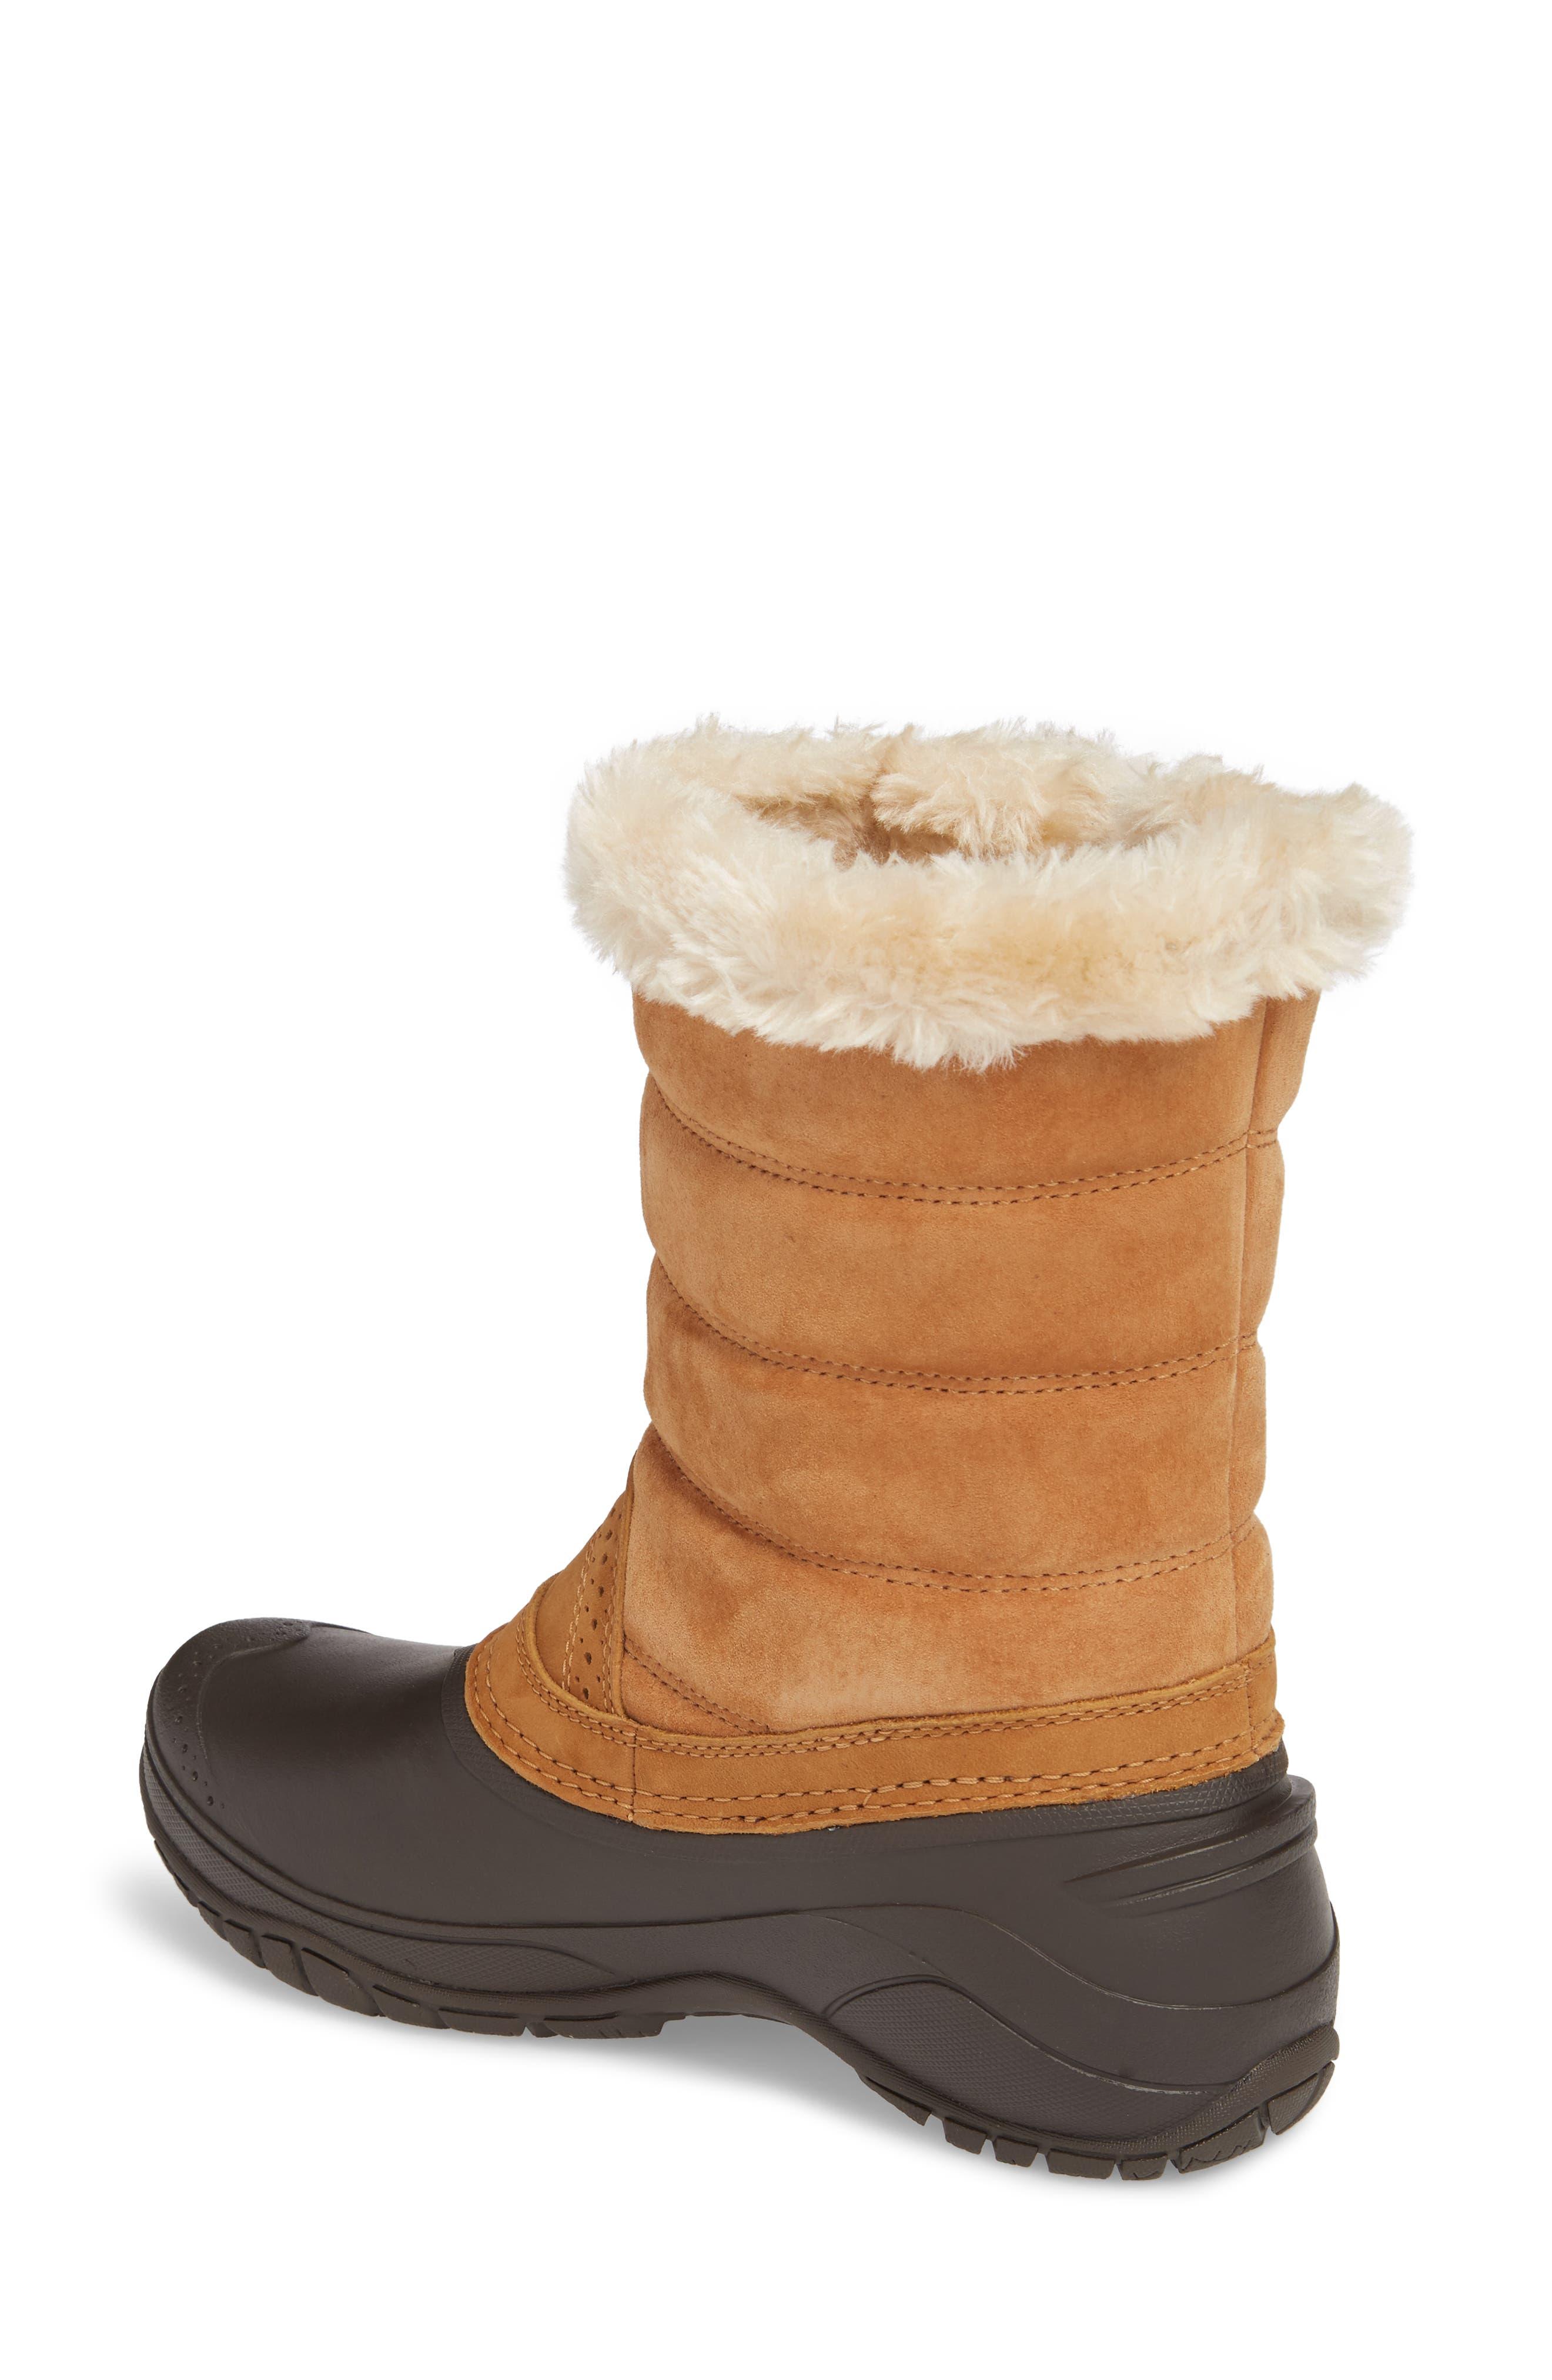 Shellista III Waterproof Pull-On Snow Boot,                             Alternate thumbnail 4, color,